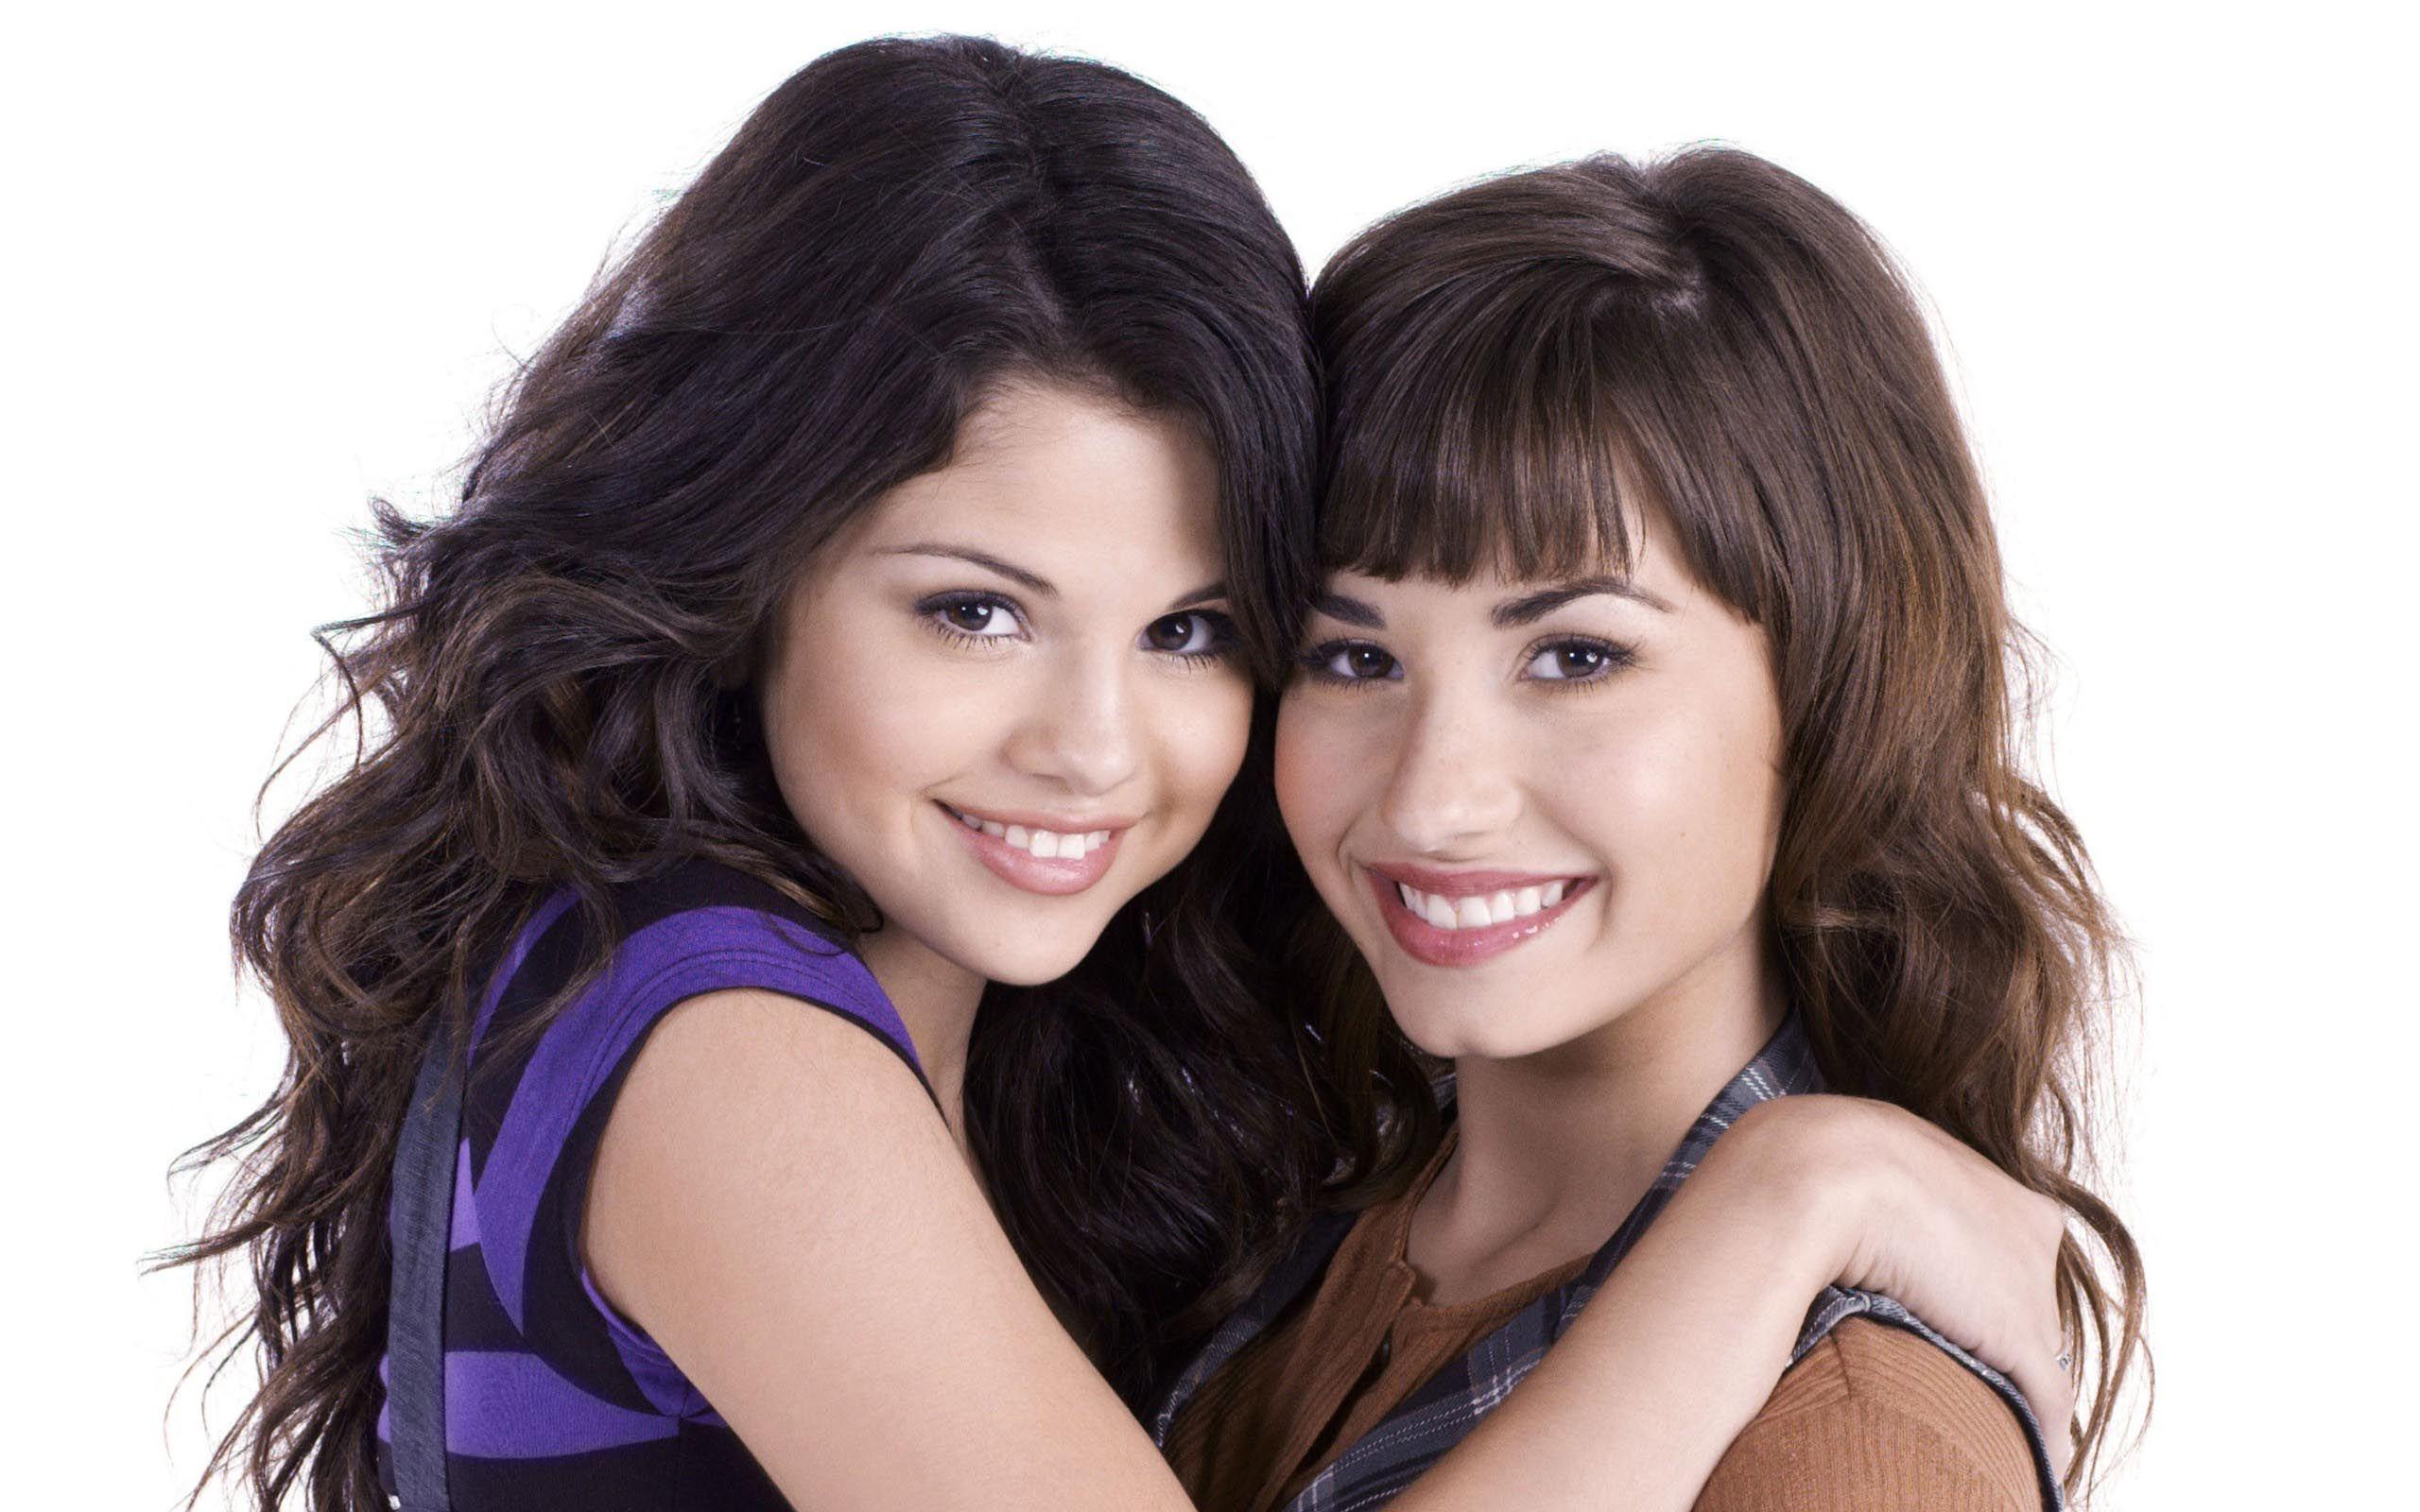 Selena Gomez And Demi Lovato Wallpapers For Desktop | www ...